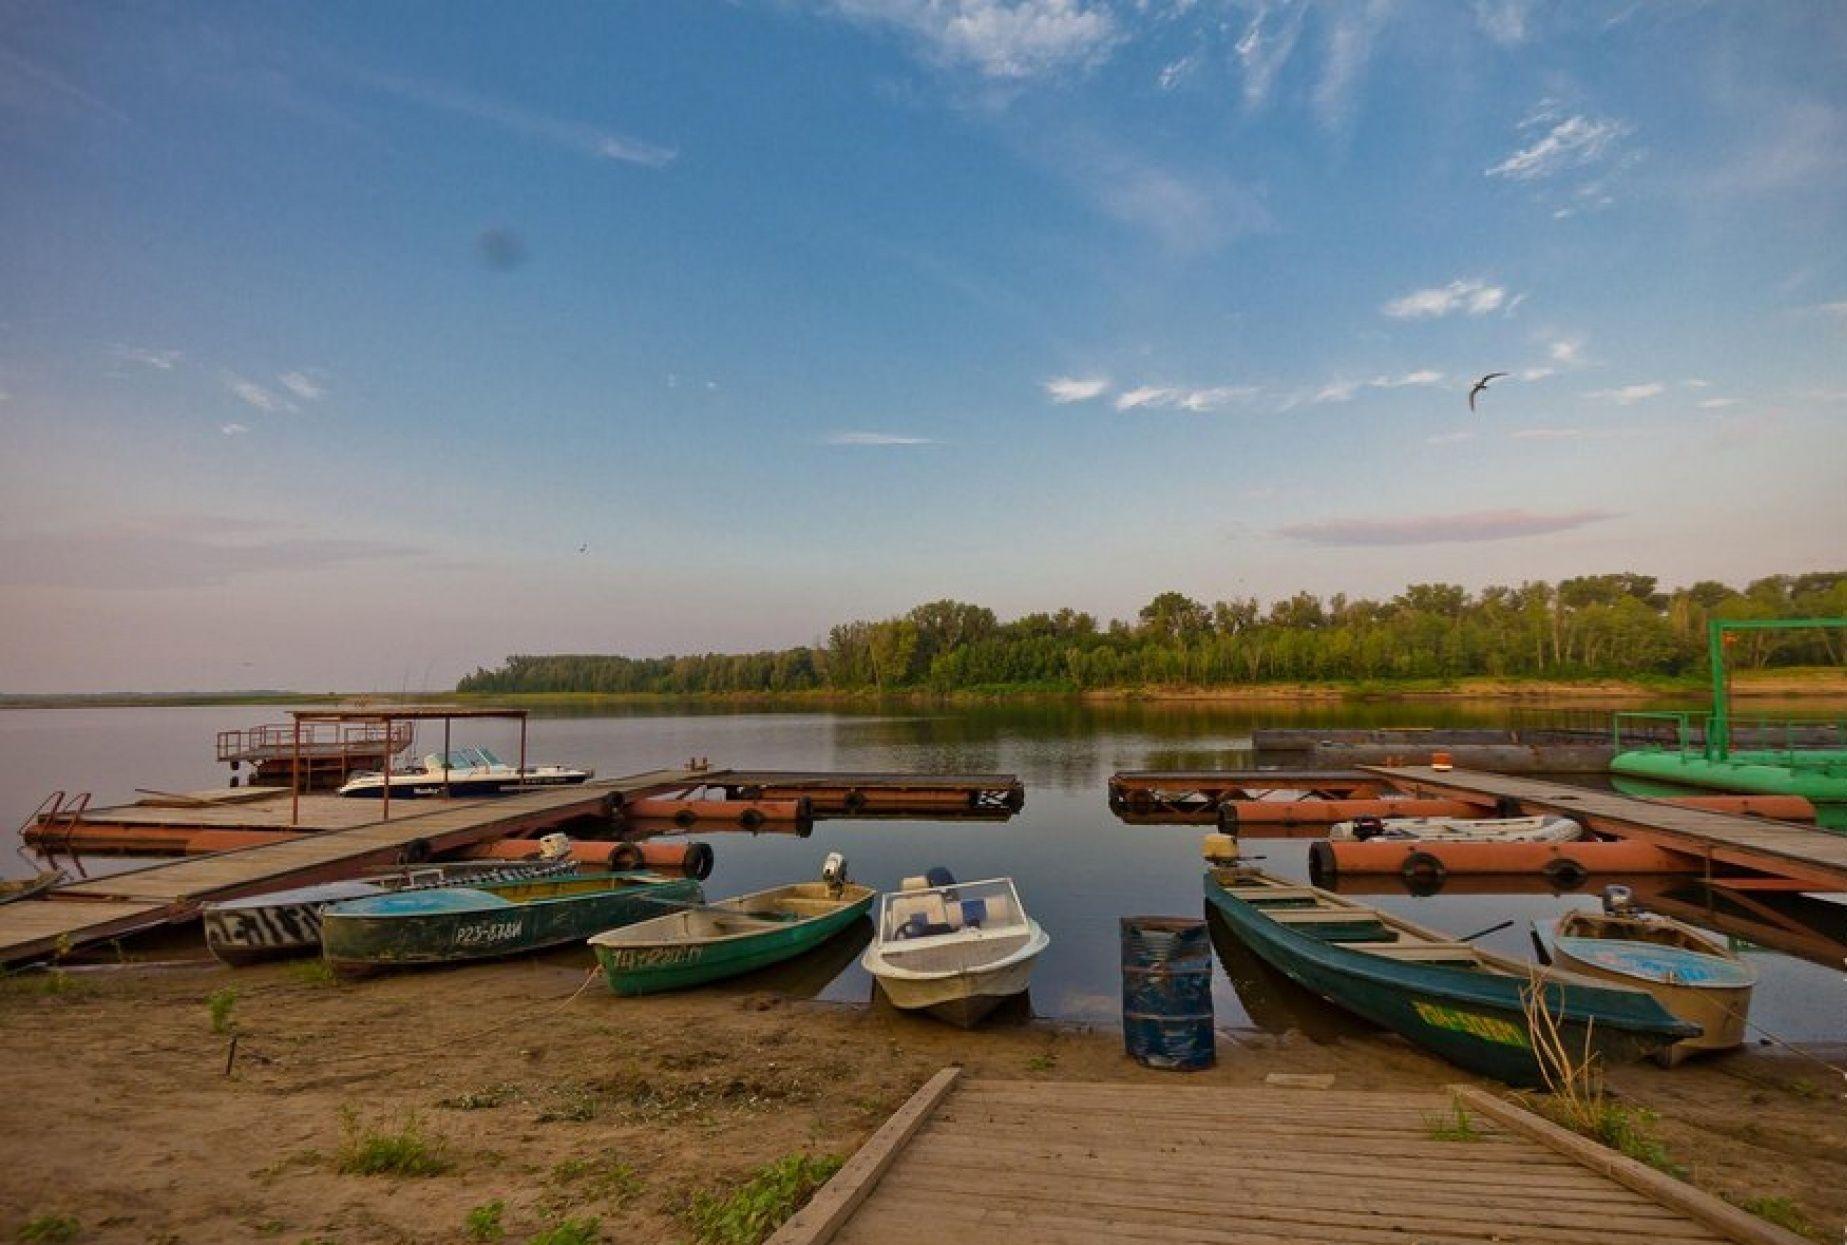 River club «Летучая рыба» Волгоградская область, фото 6